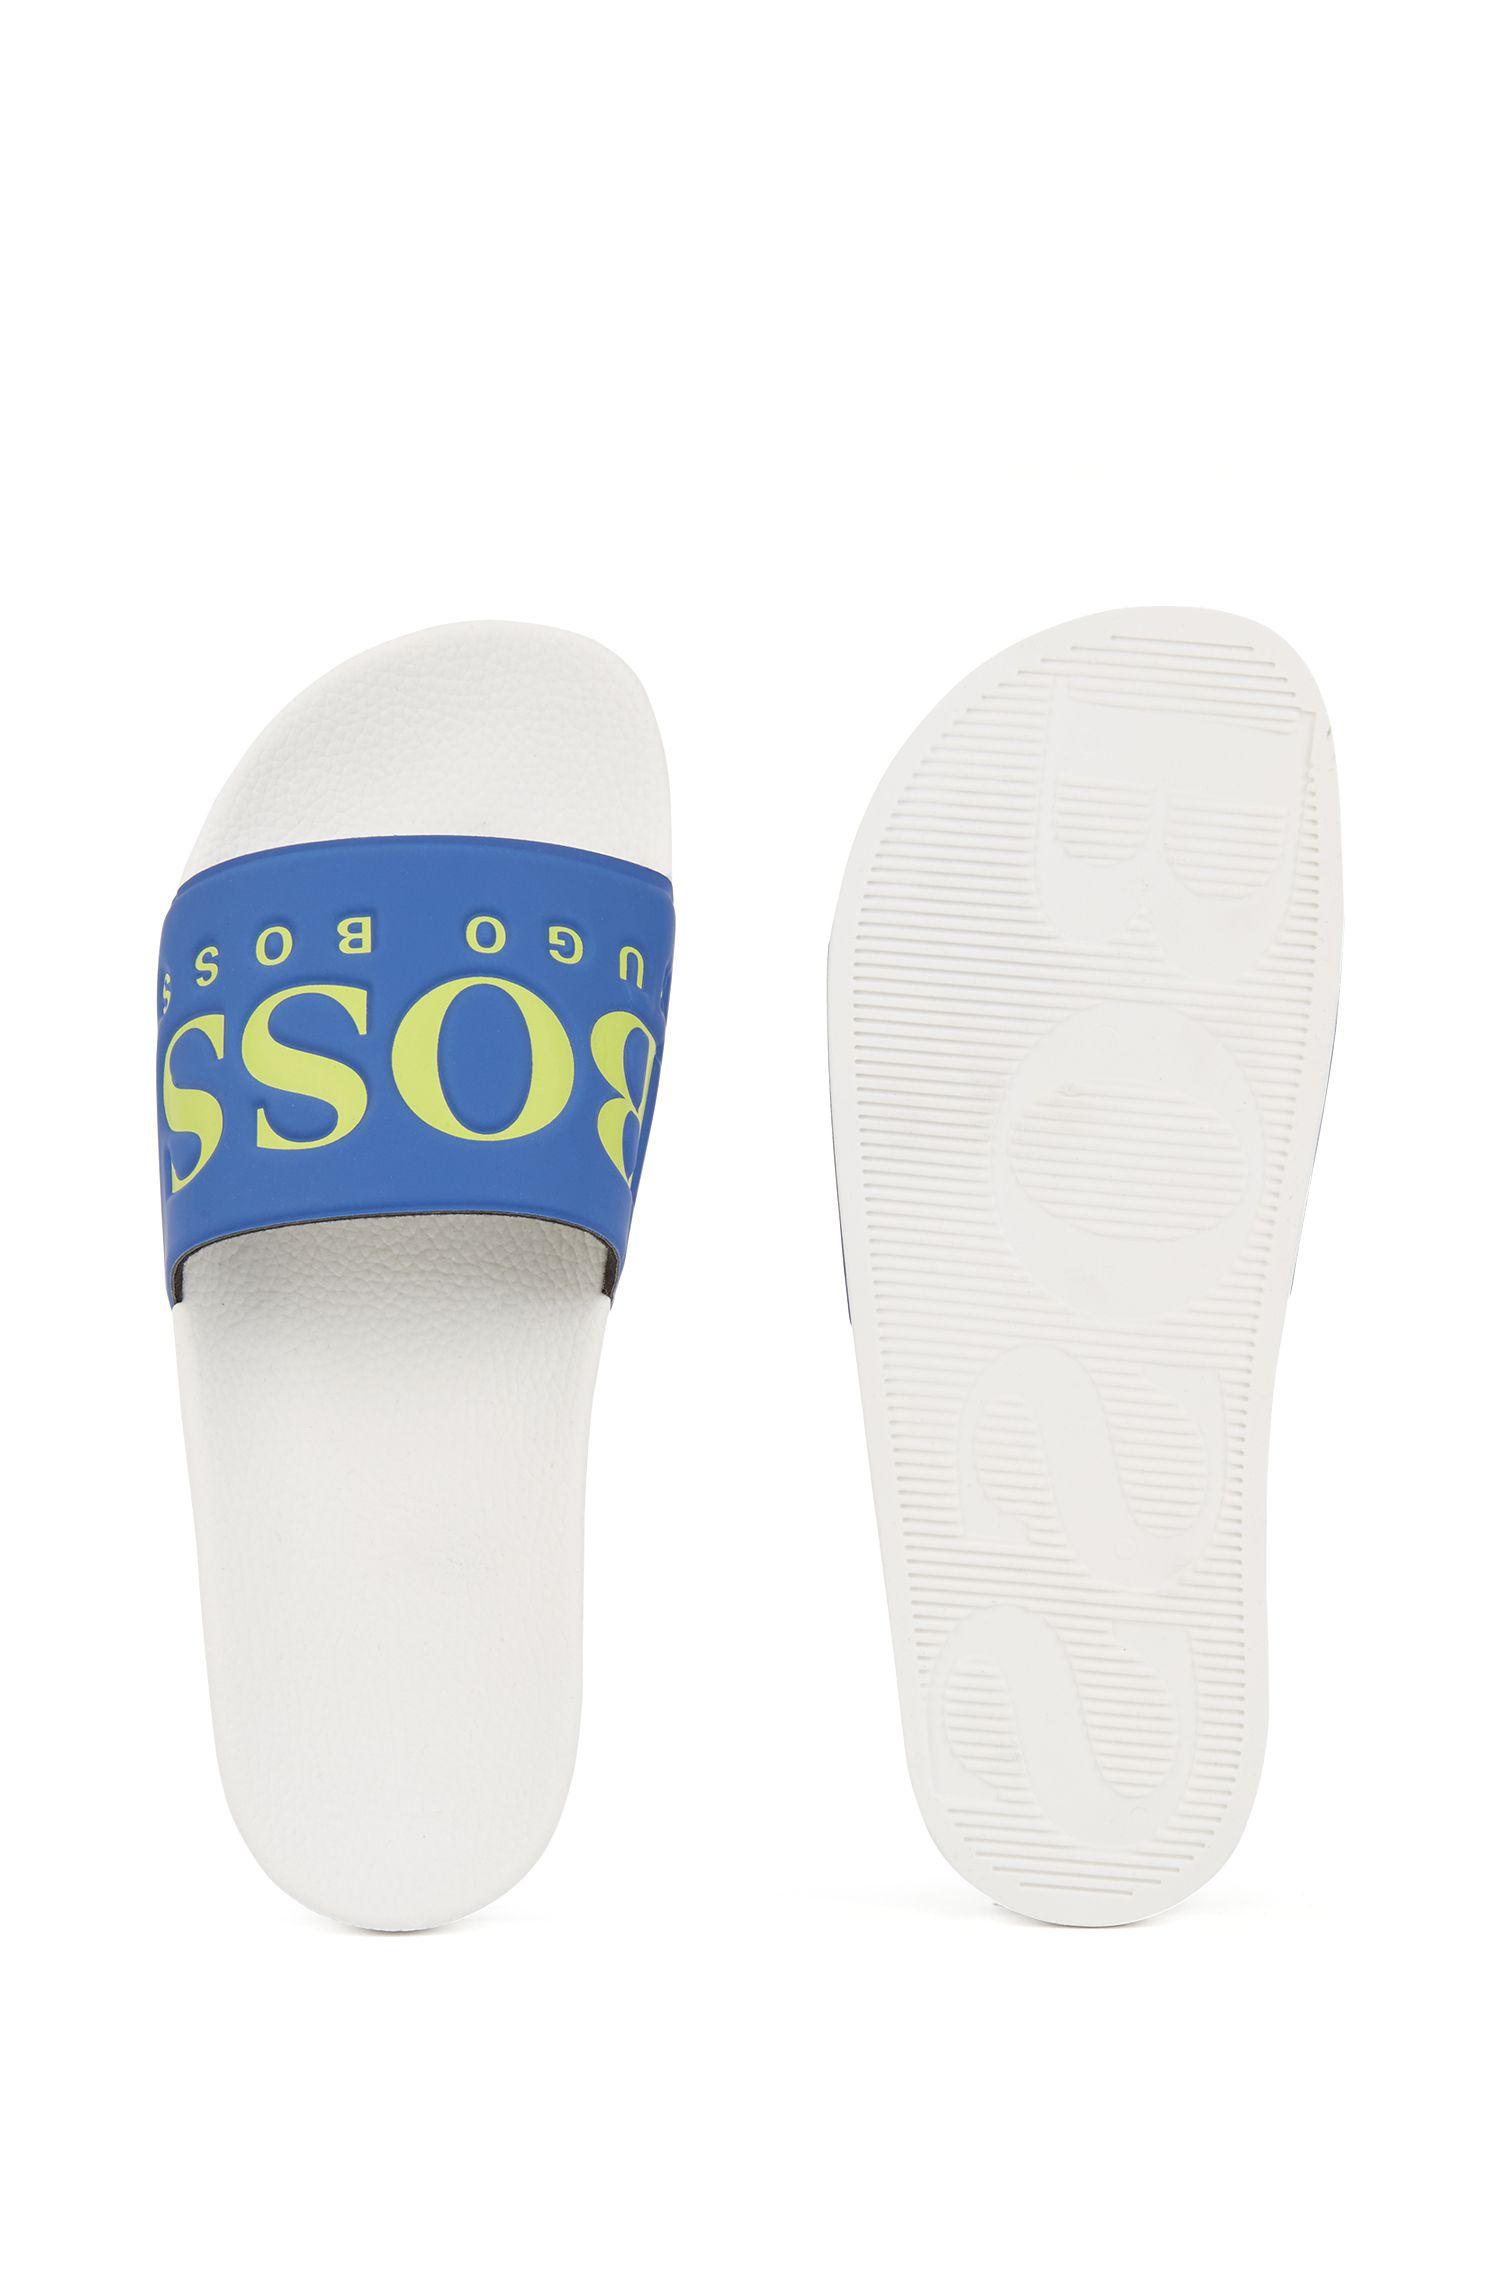 Hugo Boss - Italian-made rubber slide sandals with contrast logo - 4